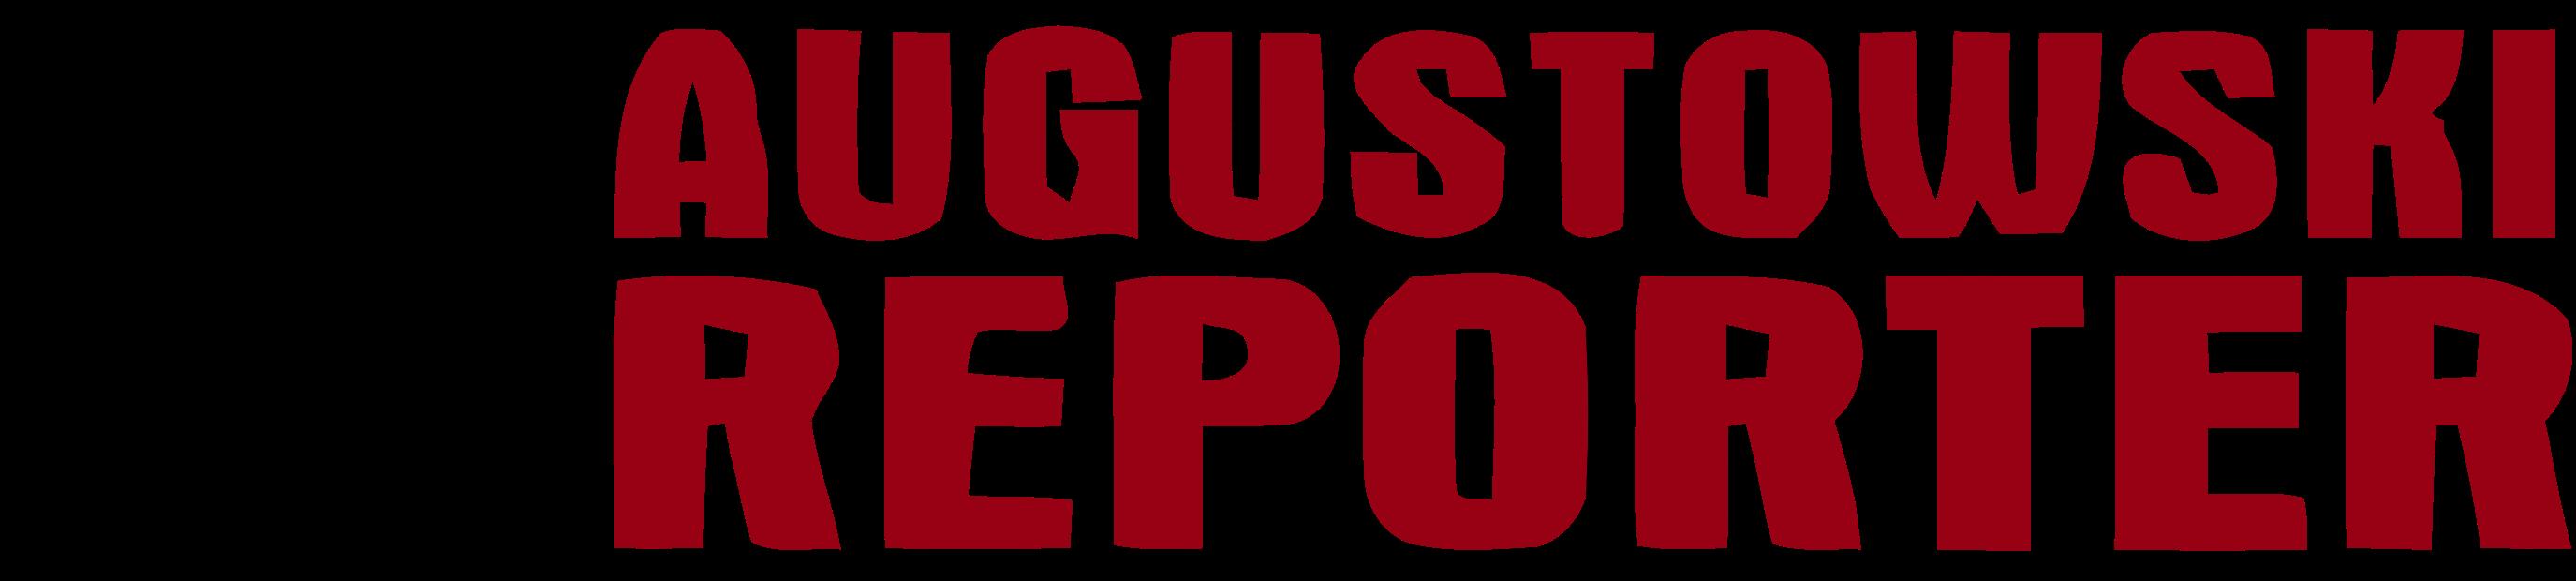 Augustowski Reporter